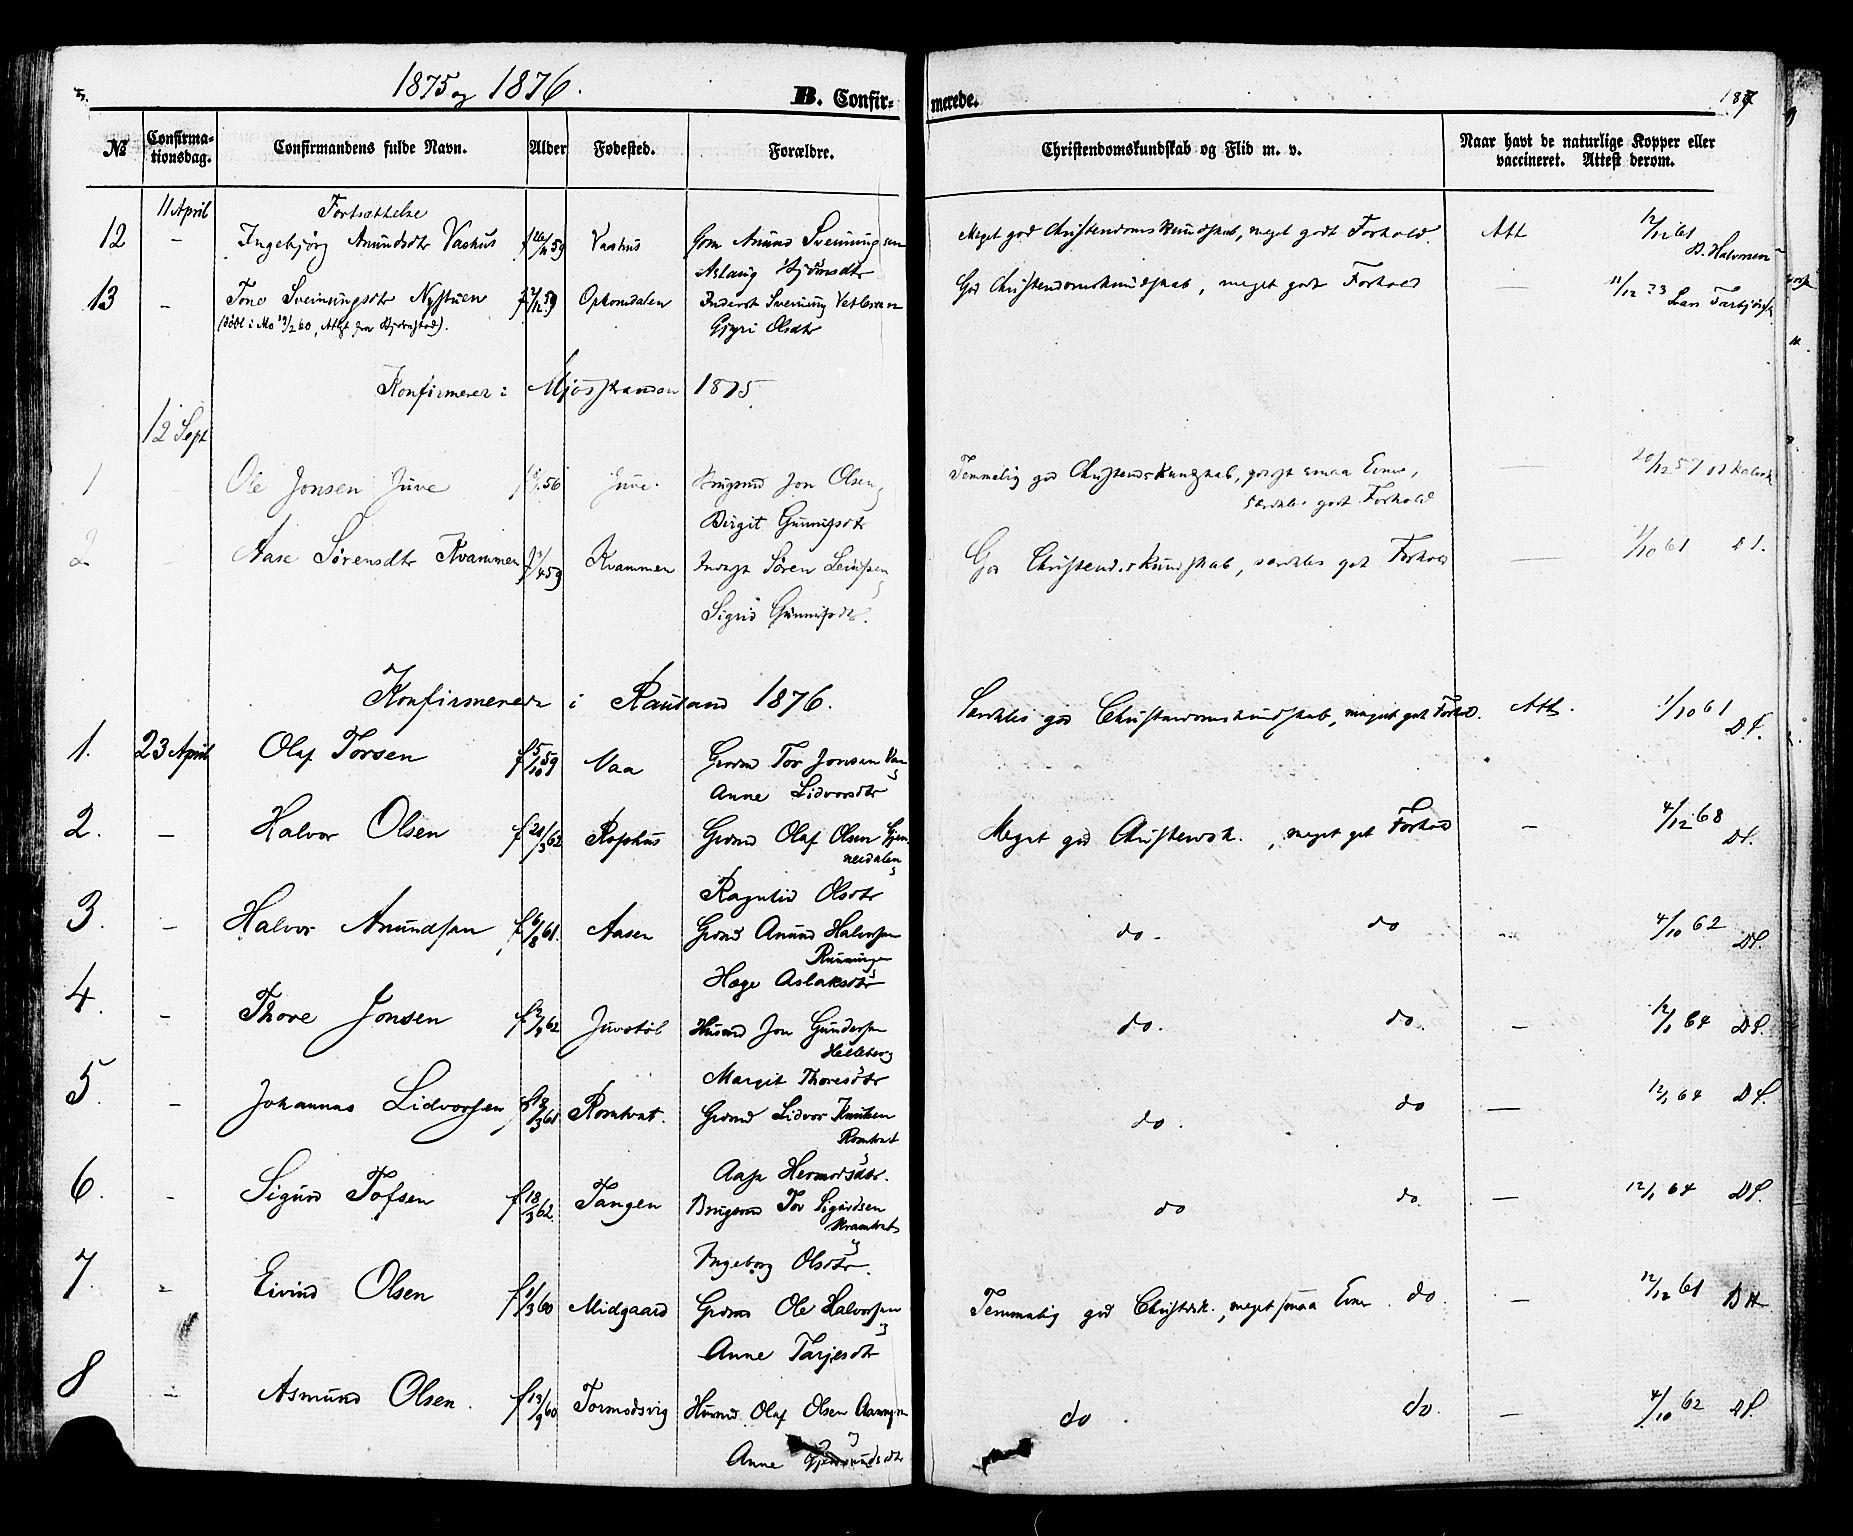 SAKO, Rauland kirkebøker, F/Fa/L0003: Ministerialbok nr. 3, 1859-1886, s. 187